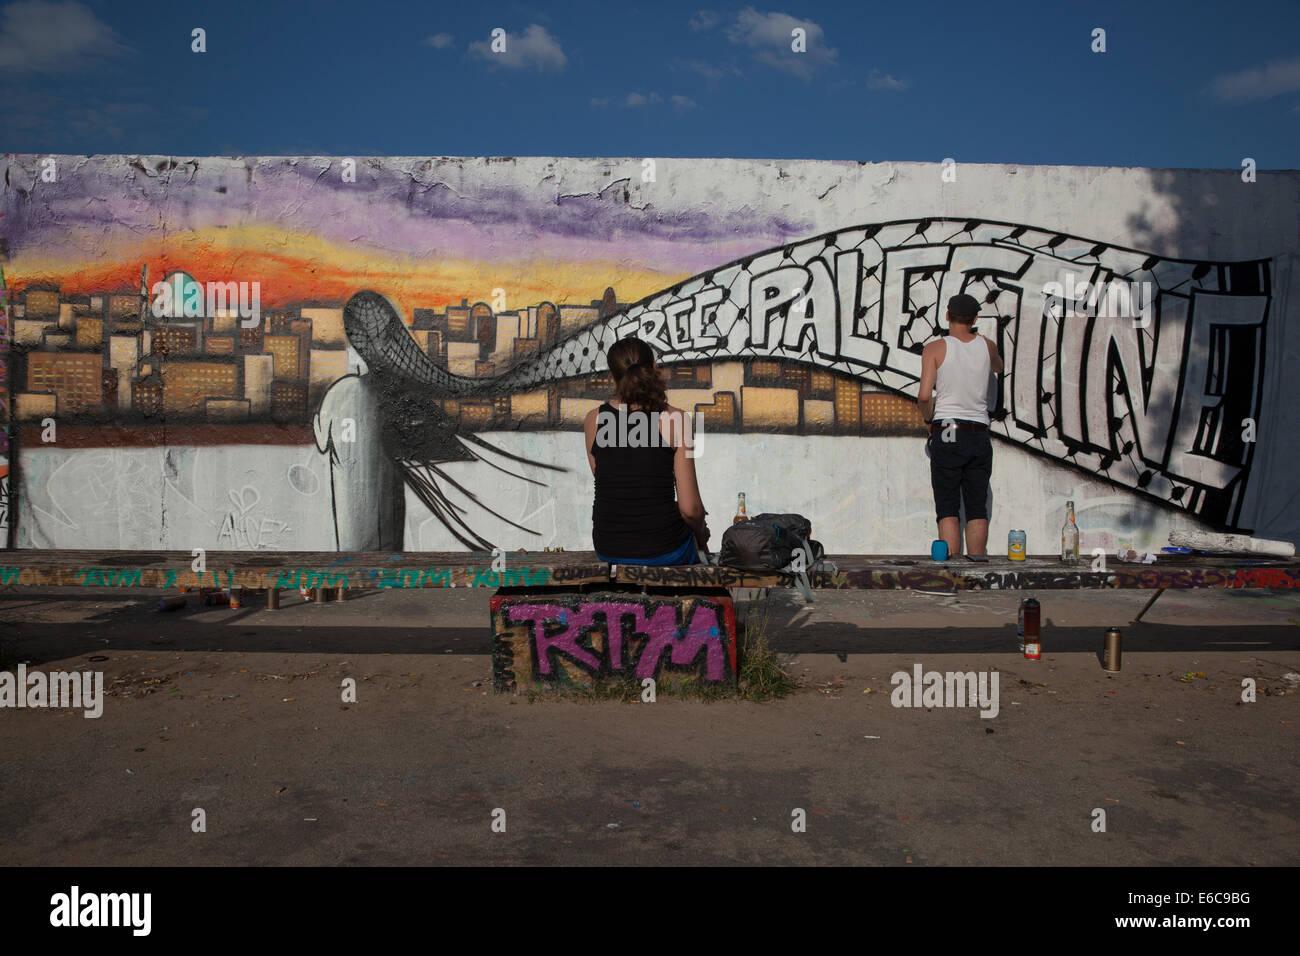 Un artista de graffiti pintado en el muro de Berlín Imagen De Stock